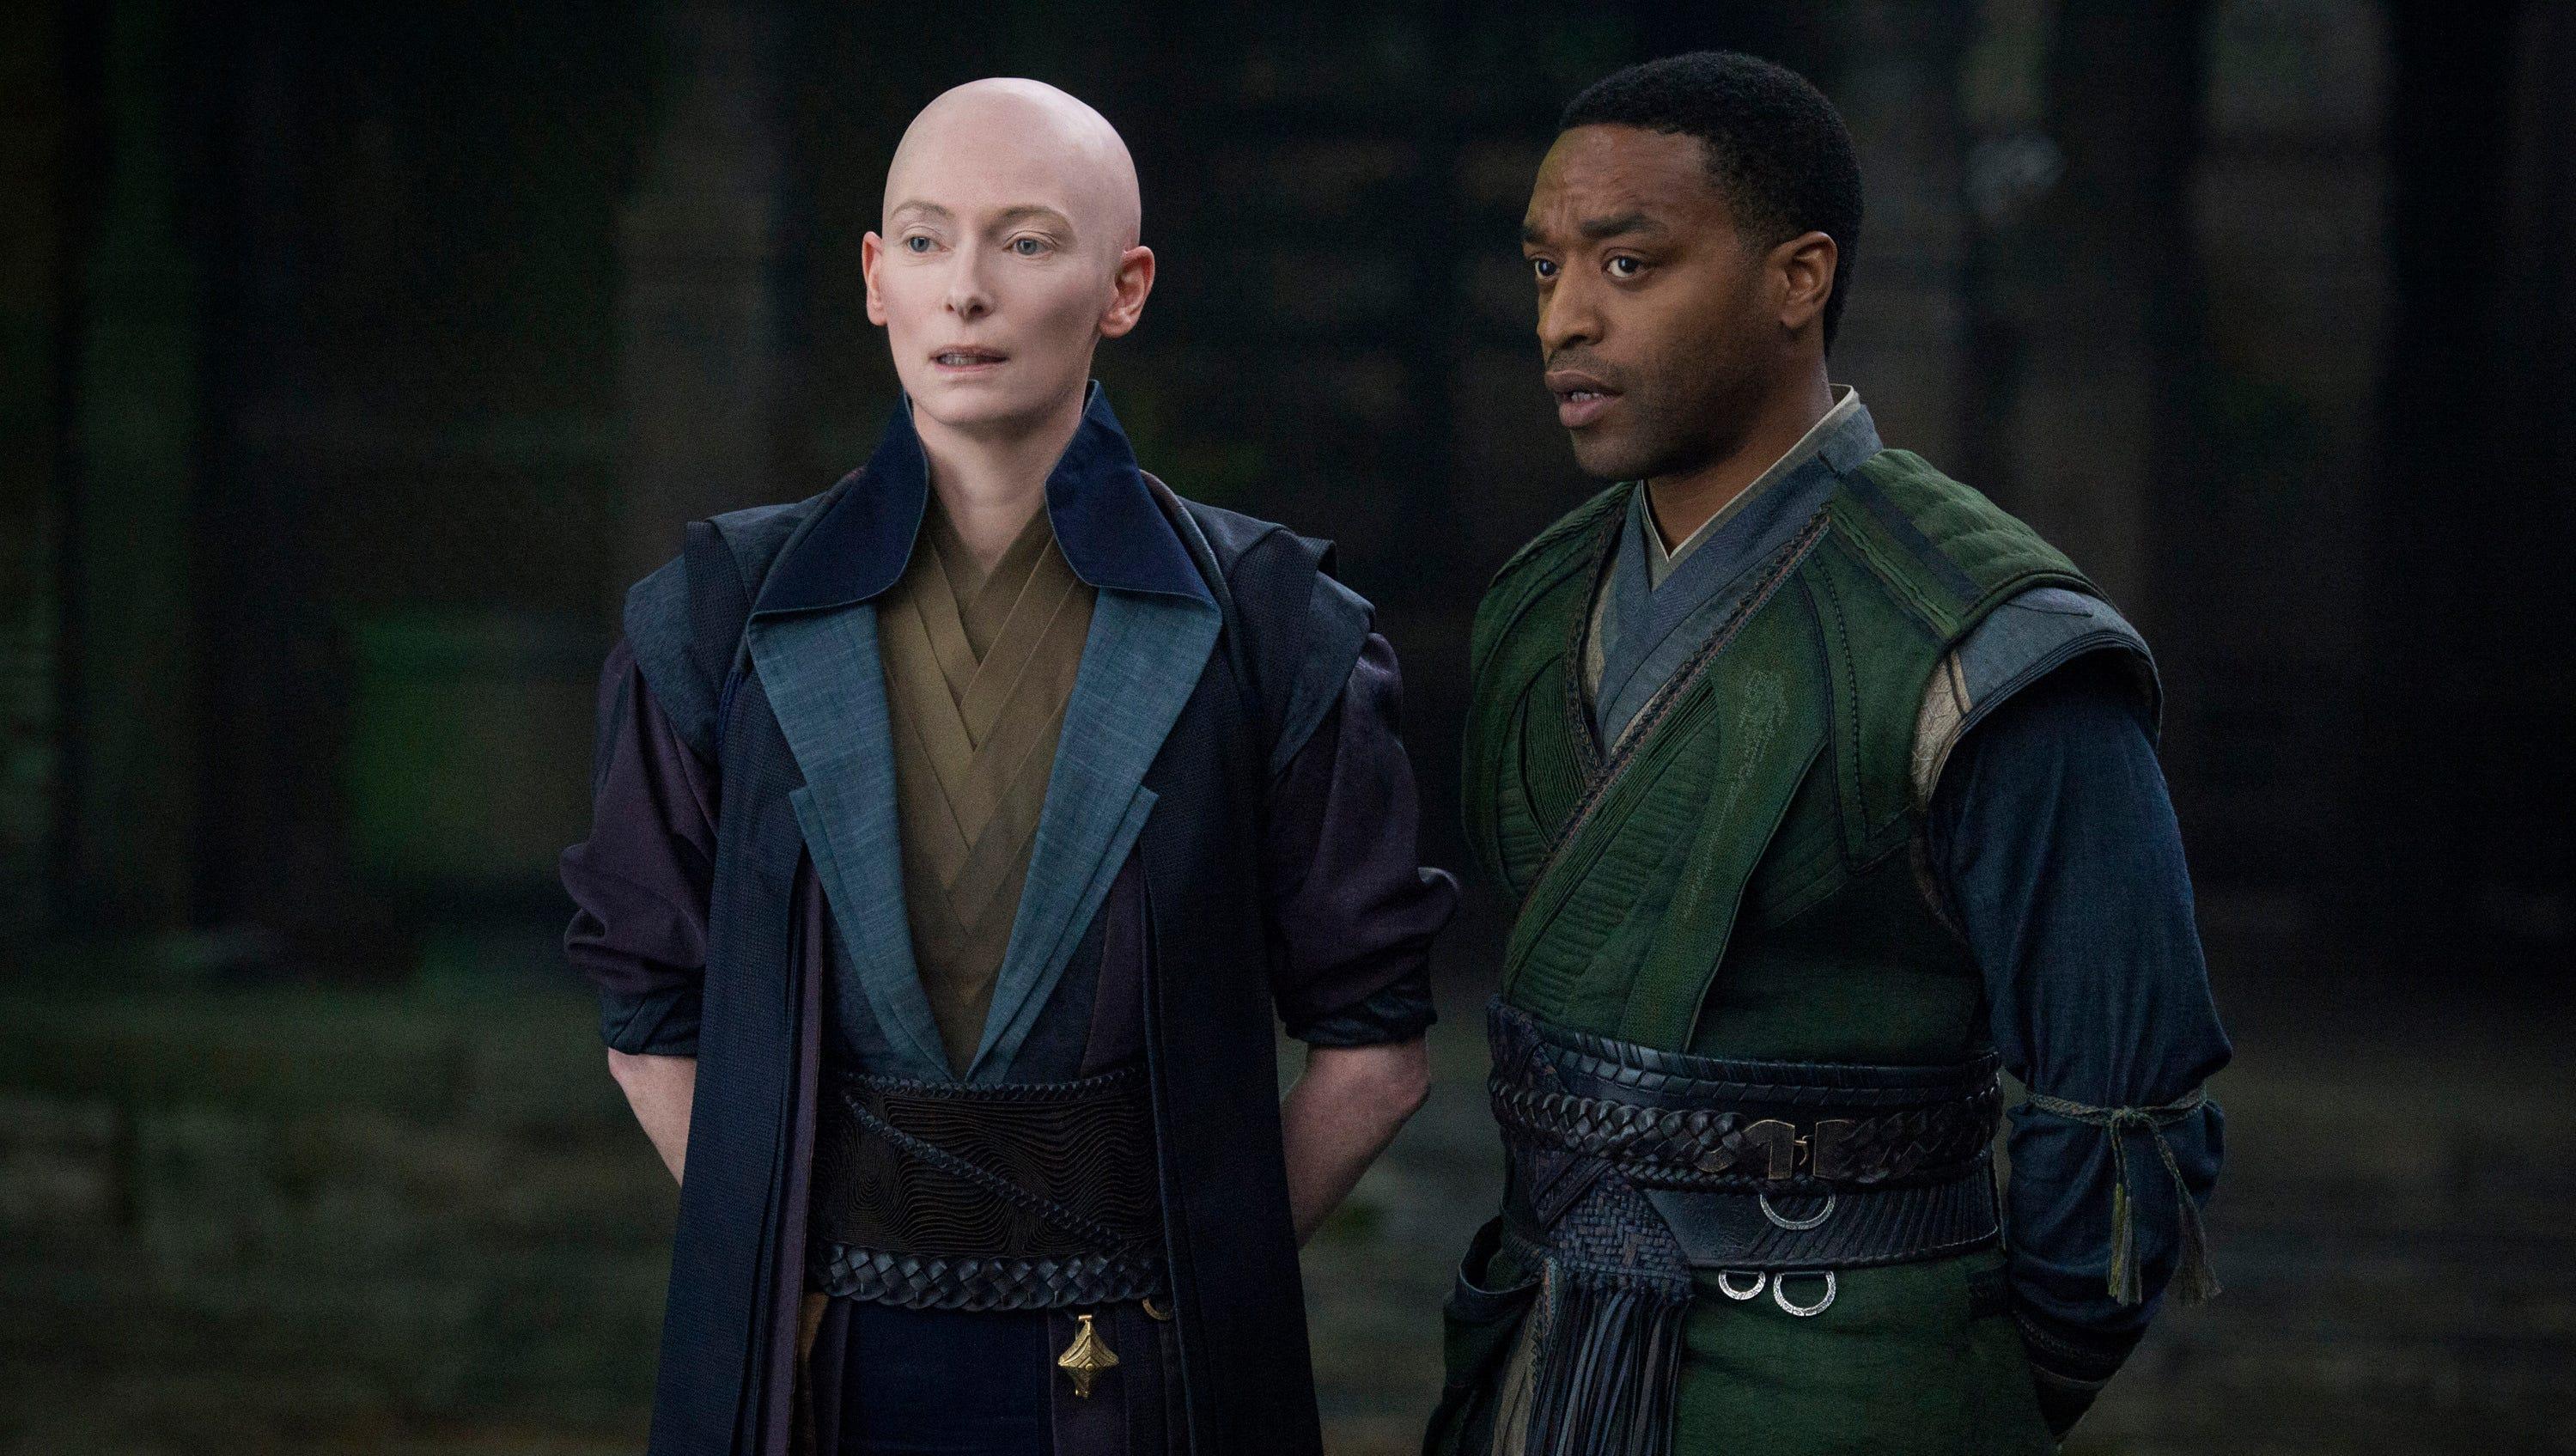 Whitewashing controversy still haunts 'Doctor Strange'